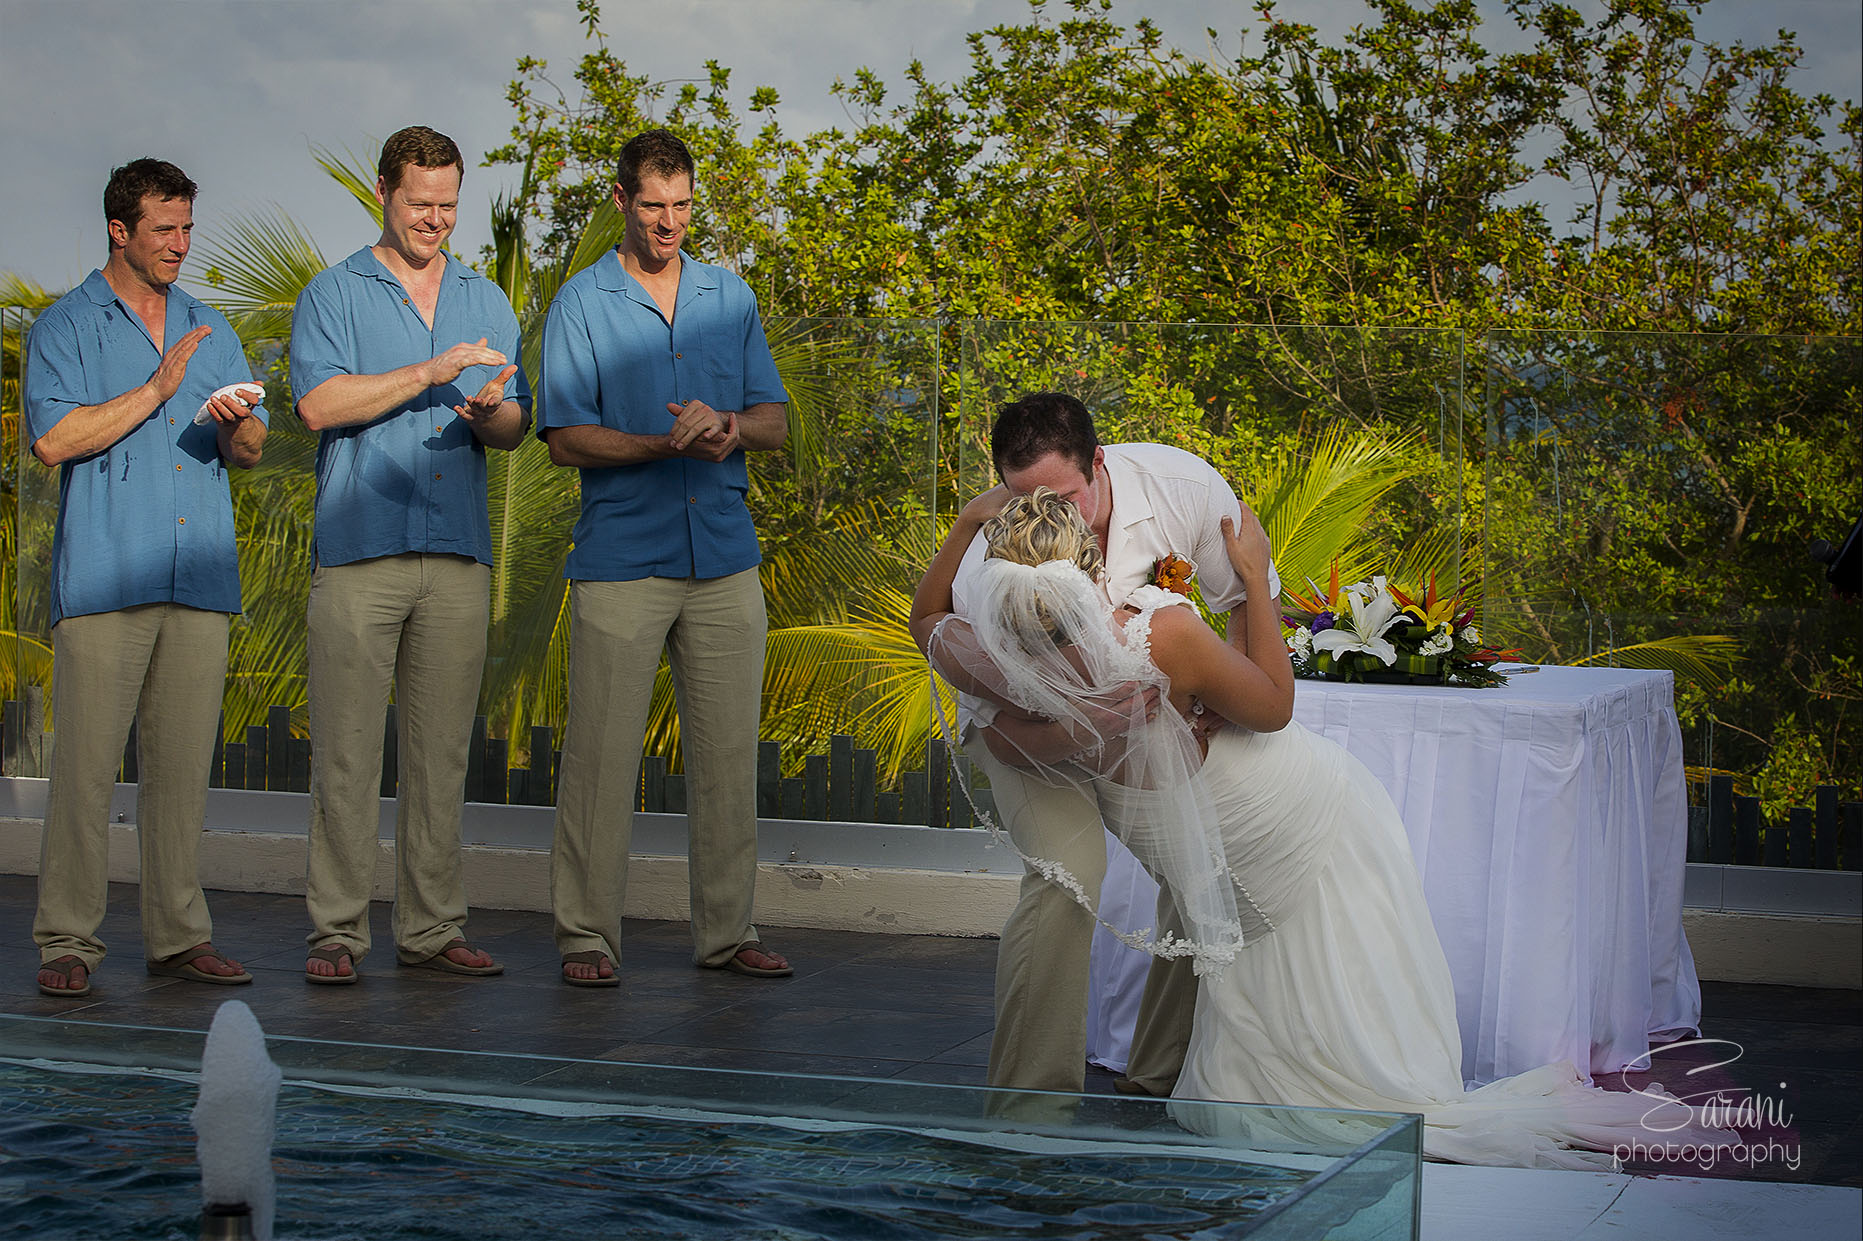 Sandos Caracol Wedding Photography